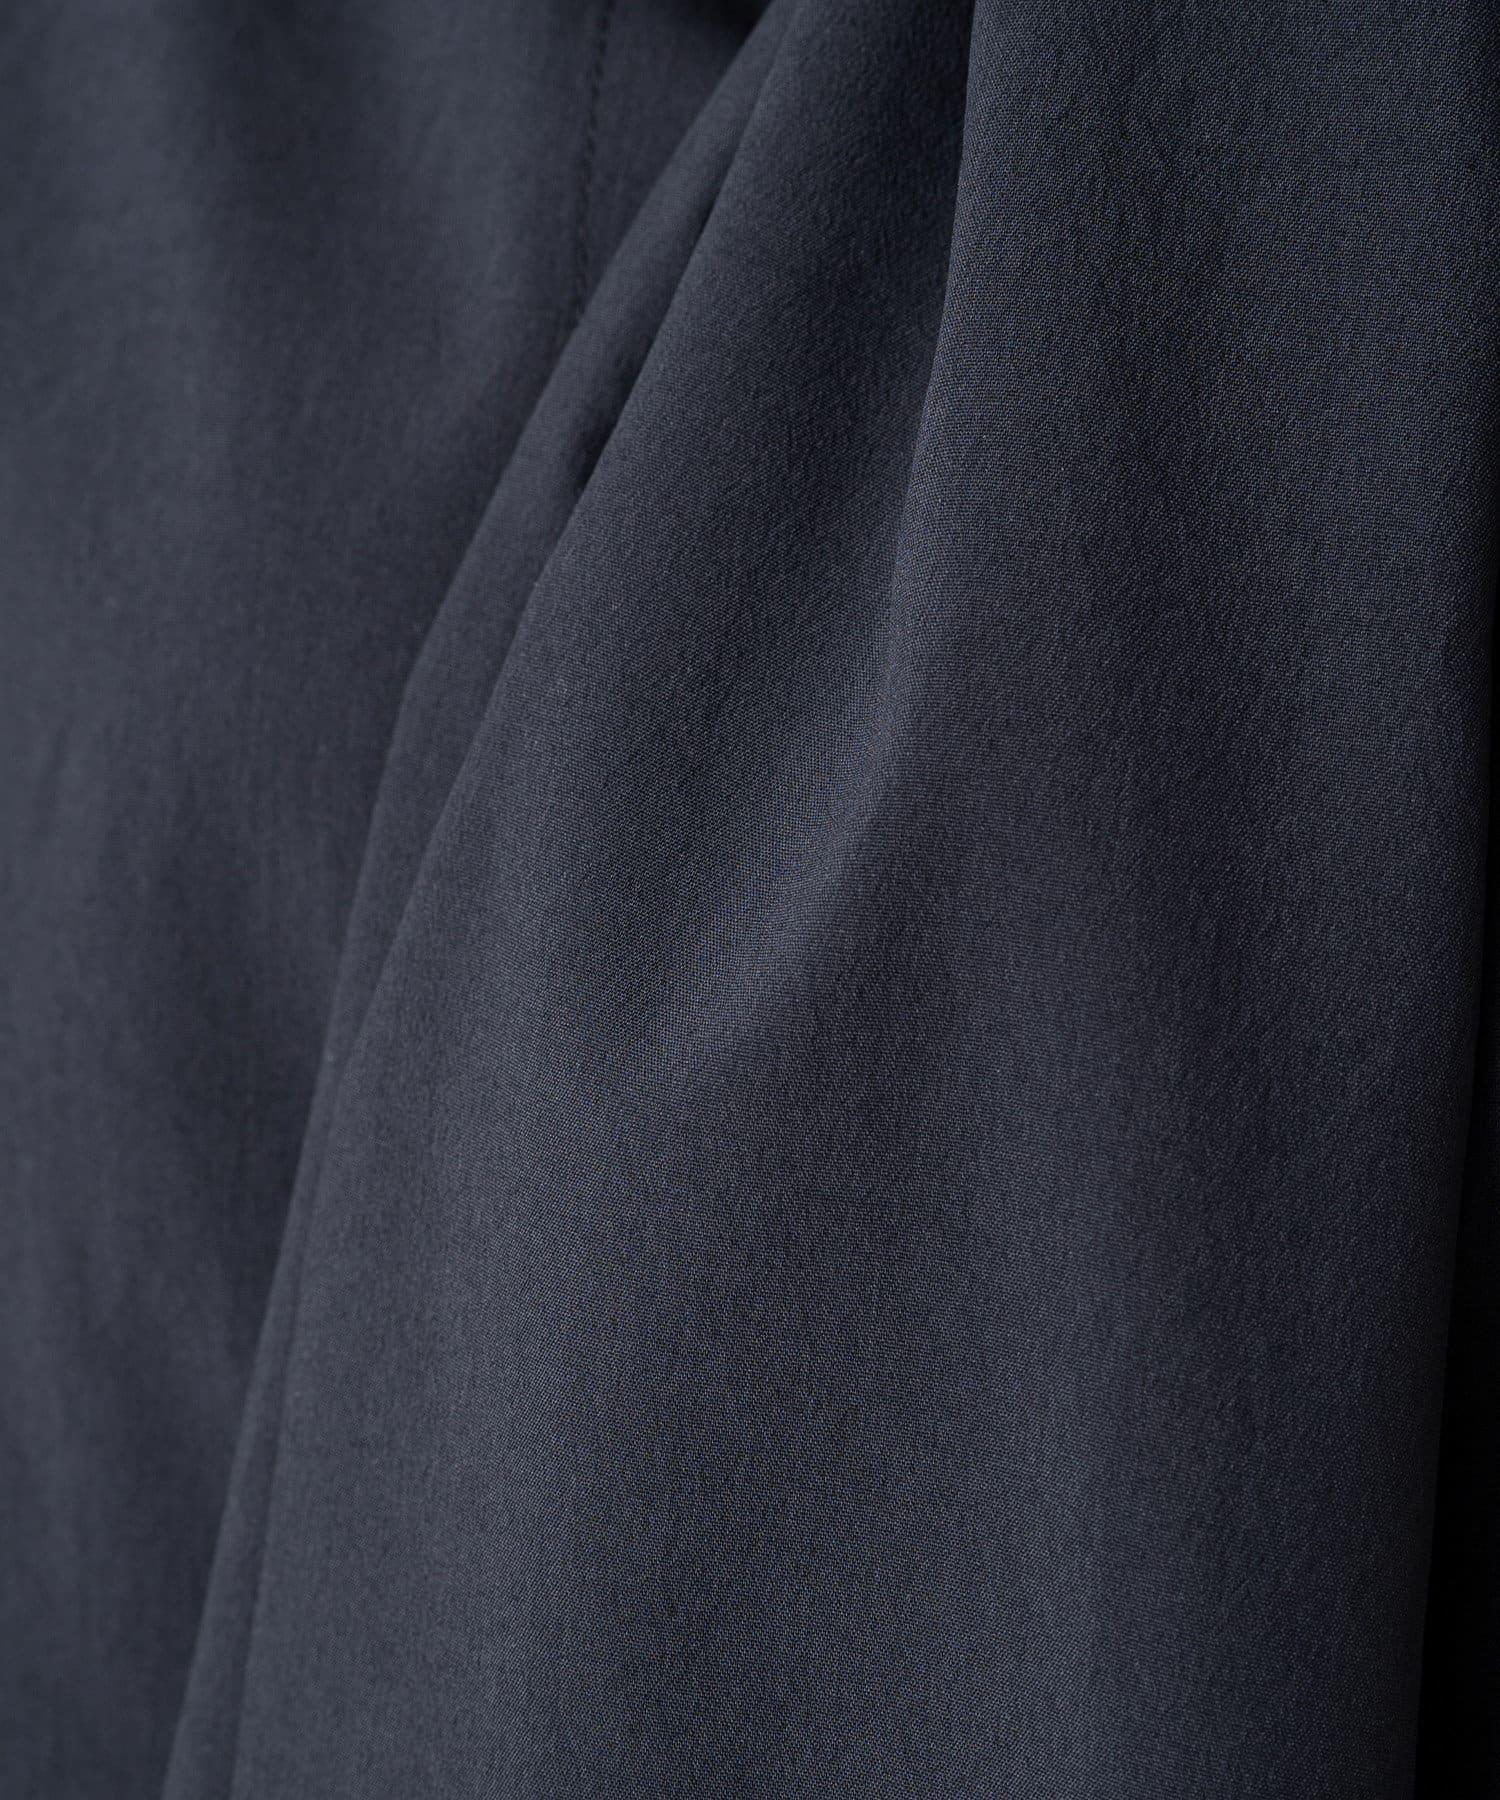 Loungedress(ラウンジドレス) ボウタイノースリブラウス